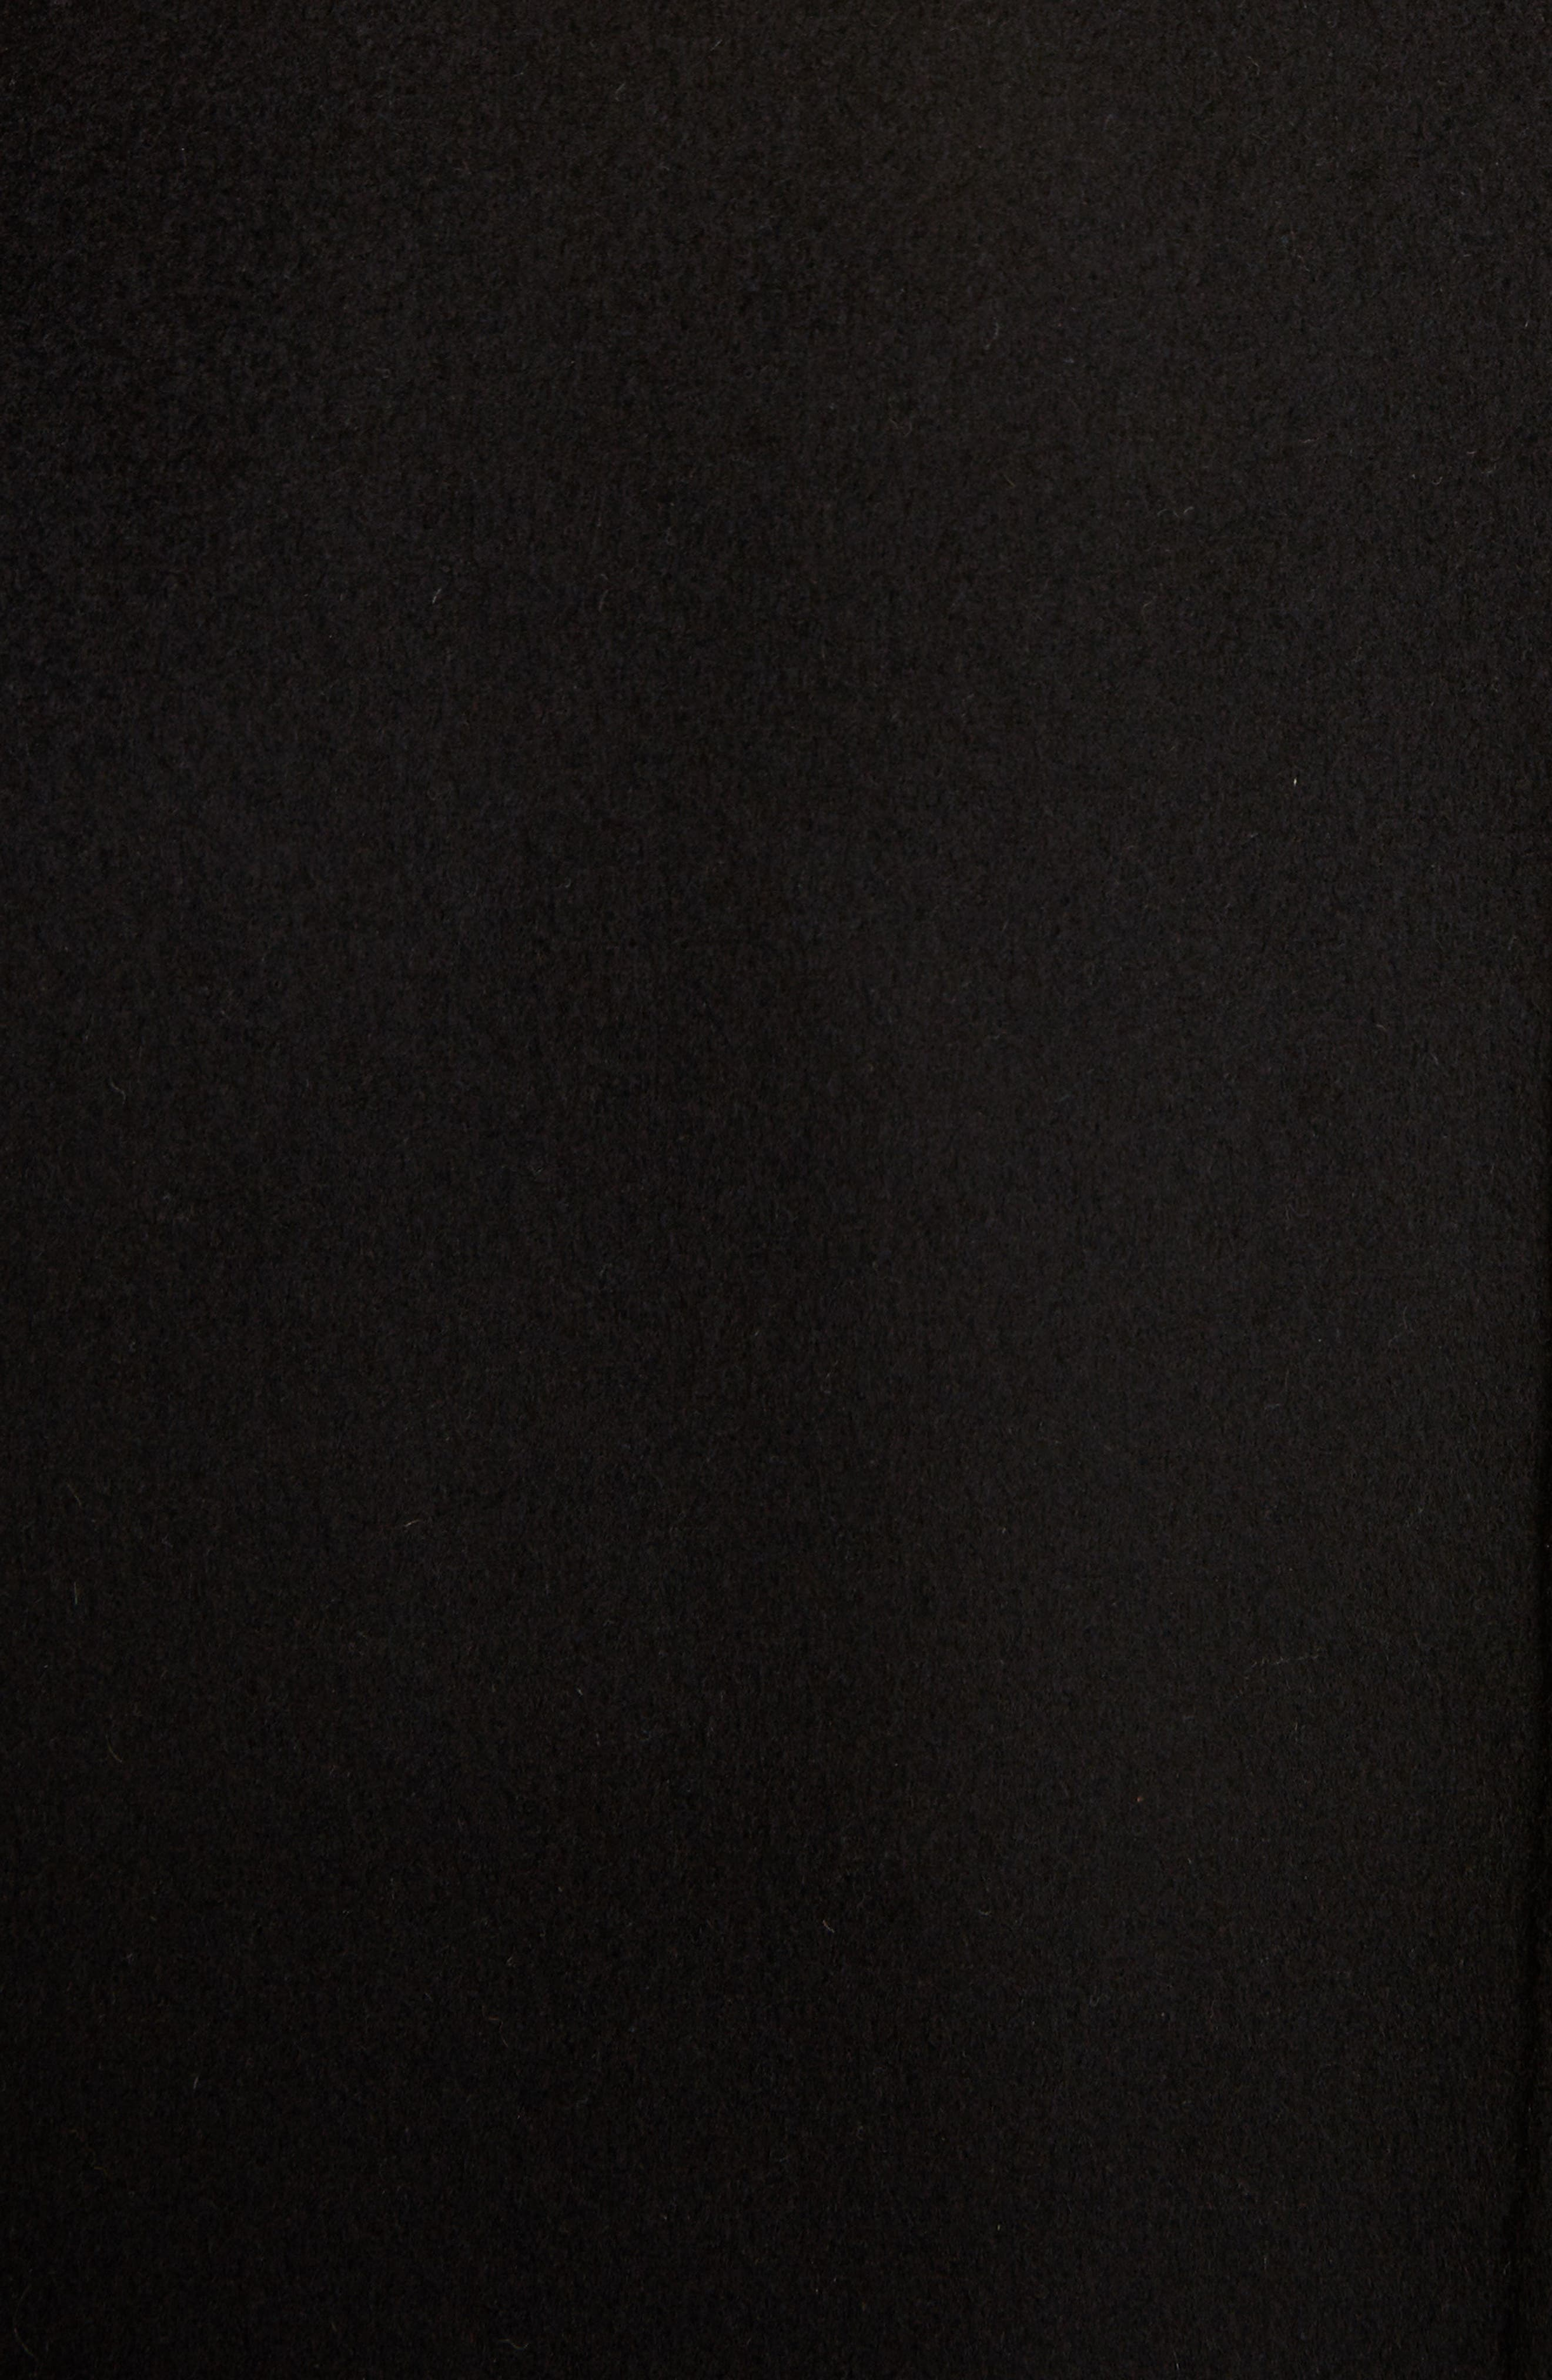 Avalon Wool & Cashmere Coat,                             Alternate thumbnail 5, color,                             Black